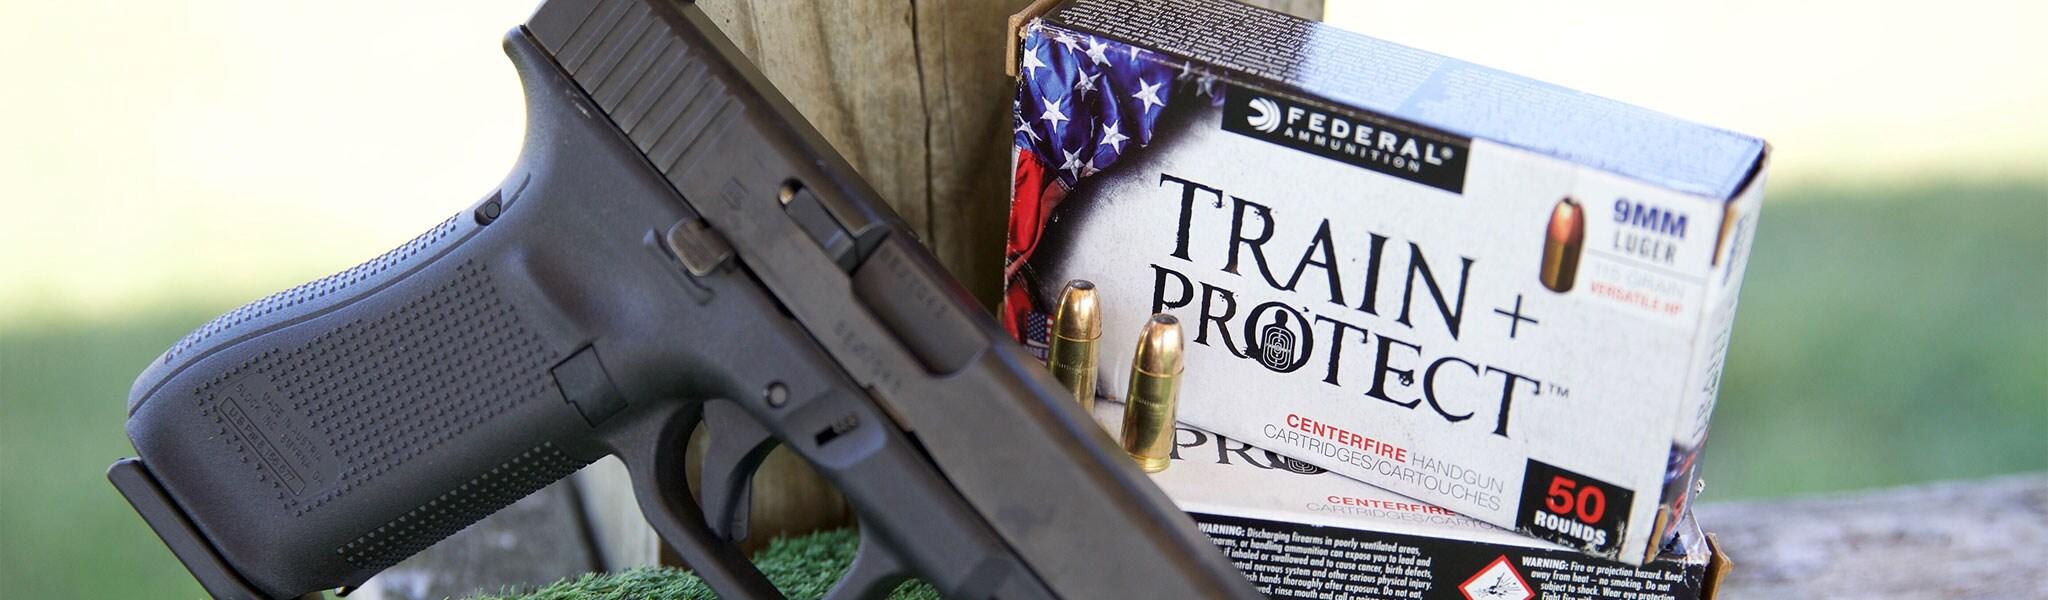 handgun ammo lifestyle